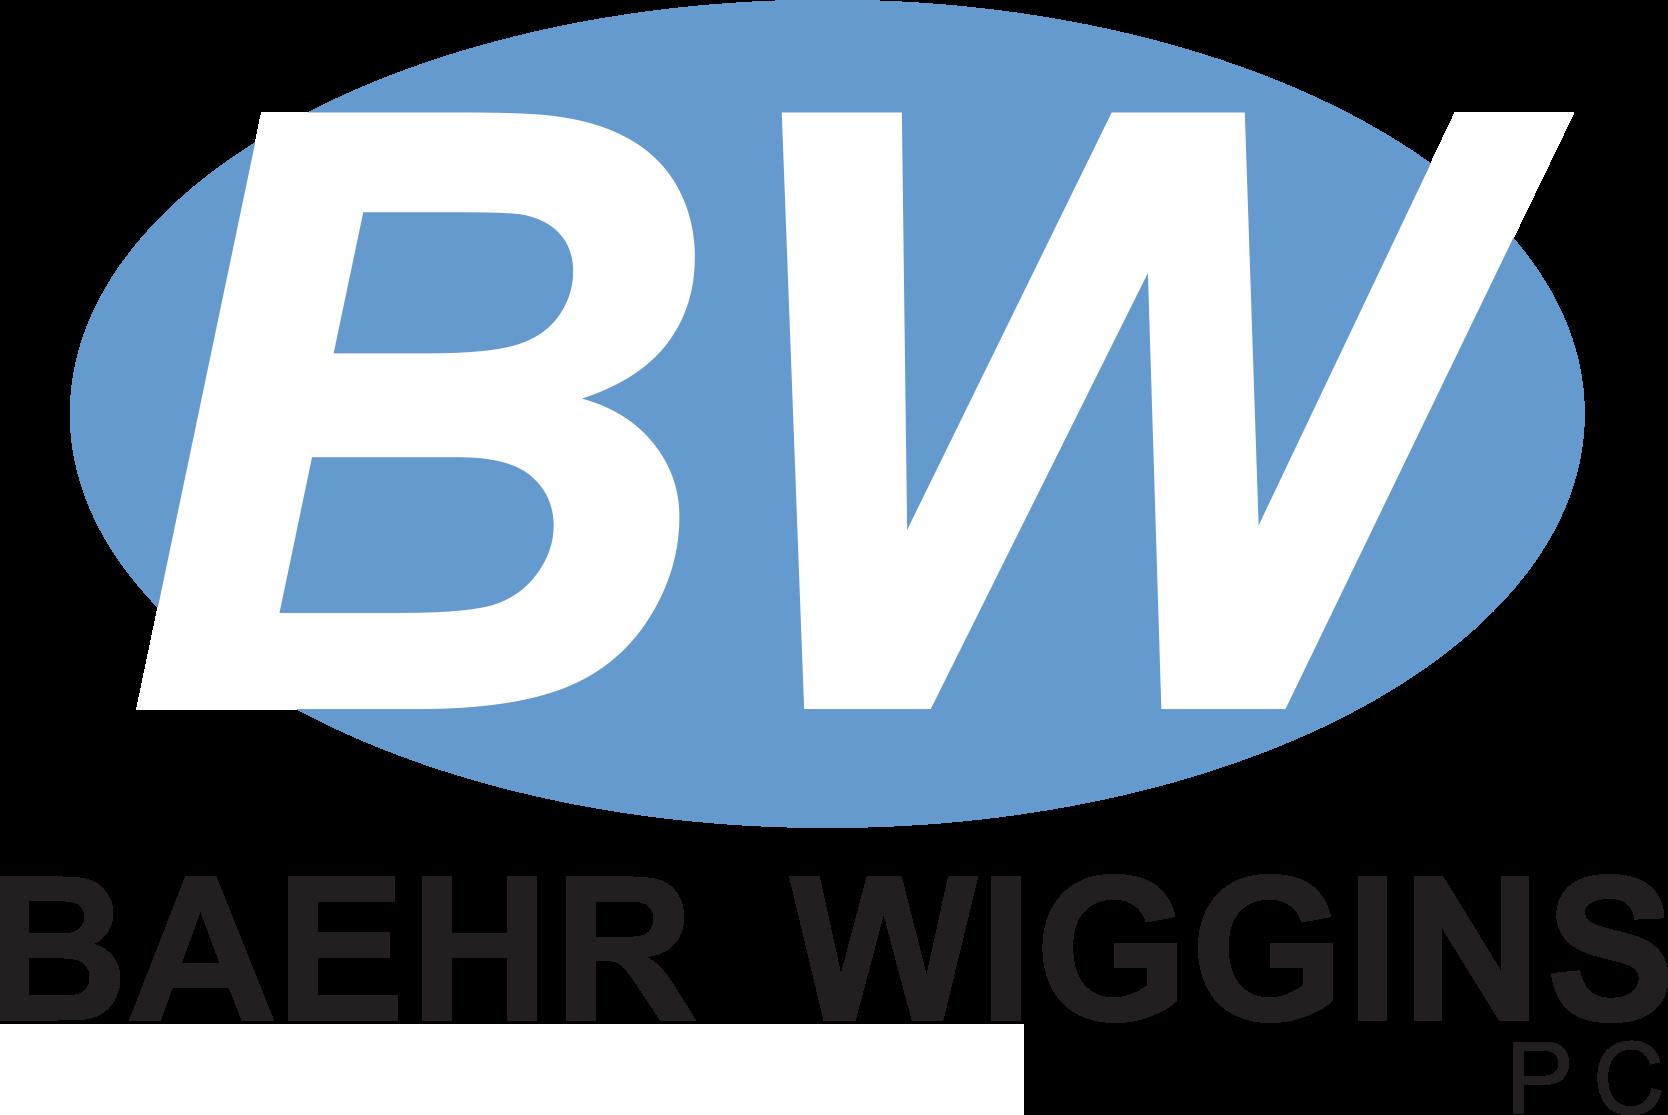 baehr_wiggins_logo.png